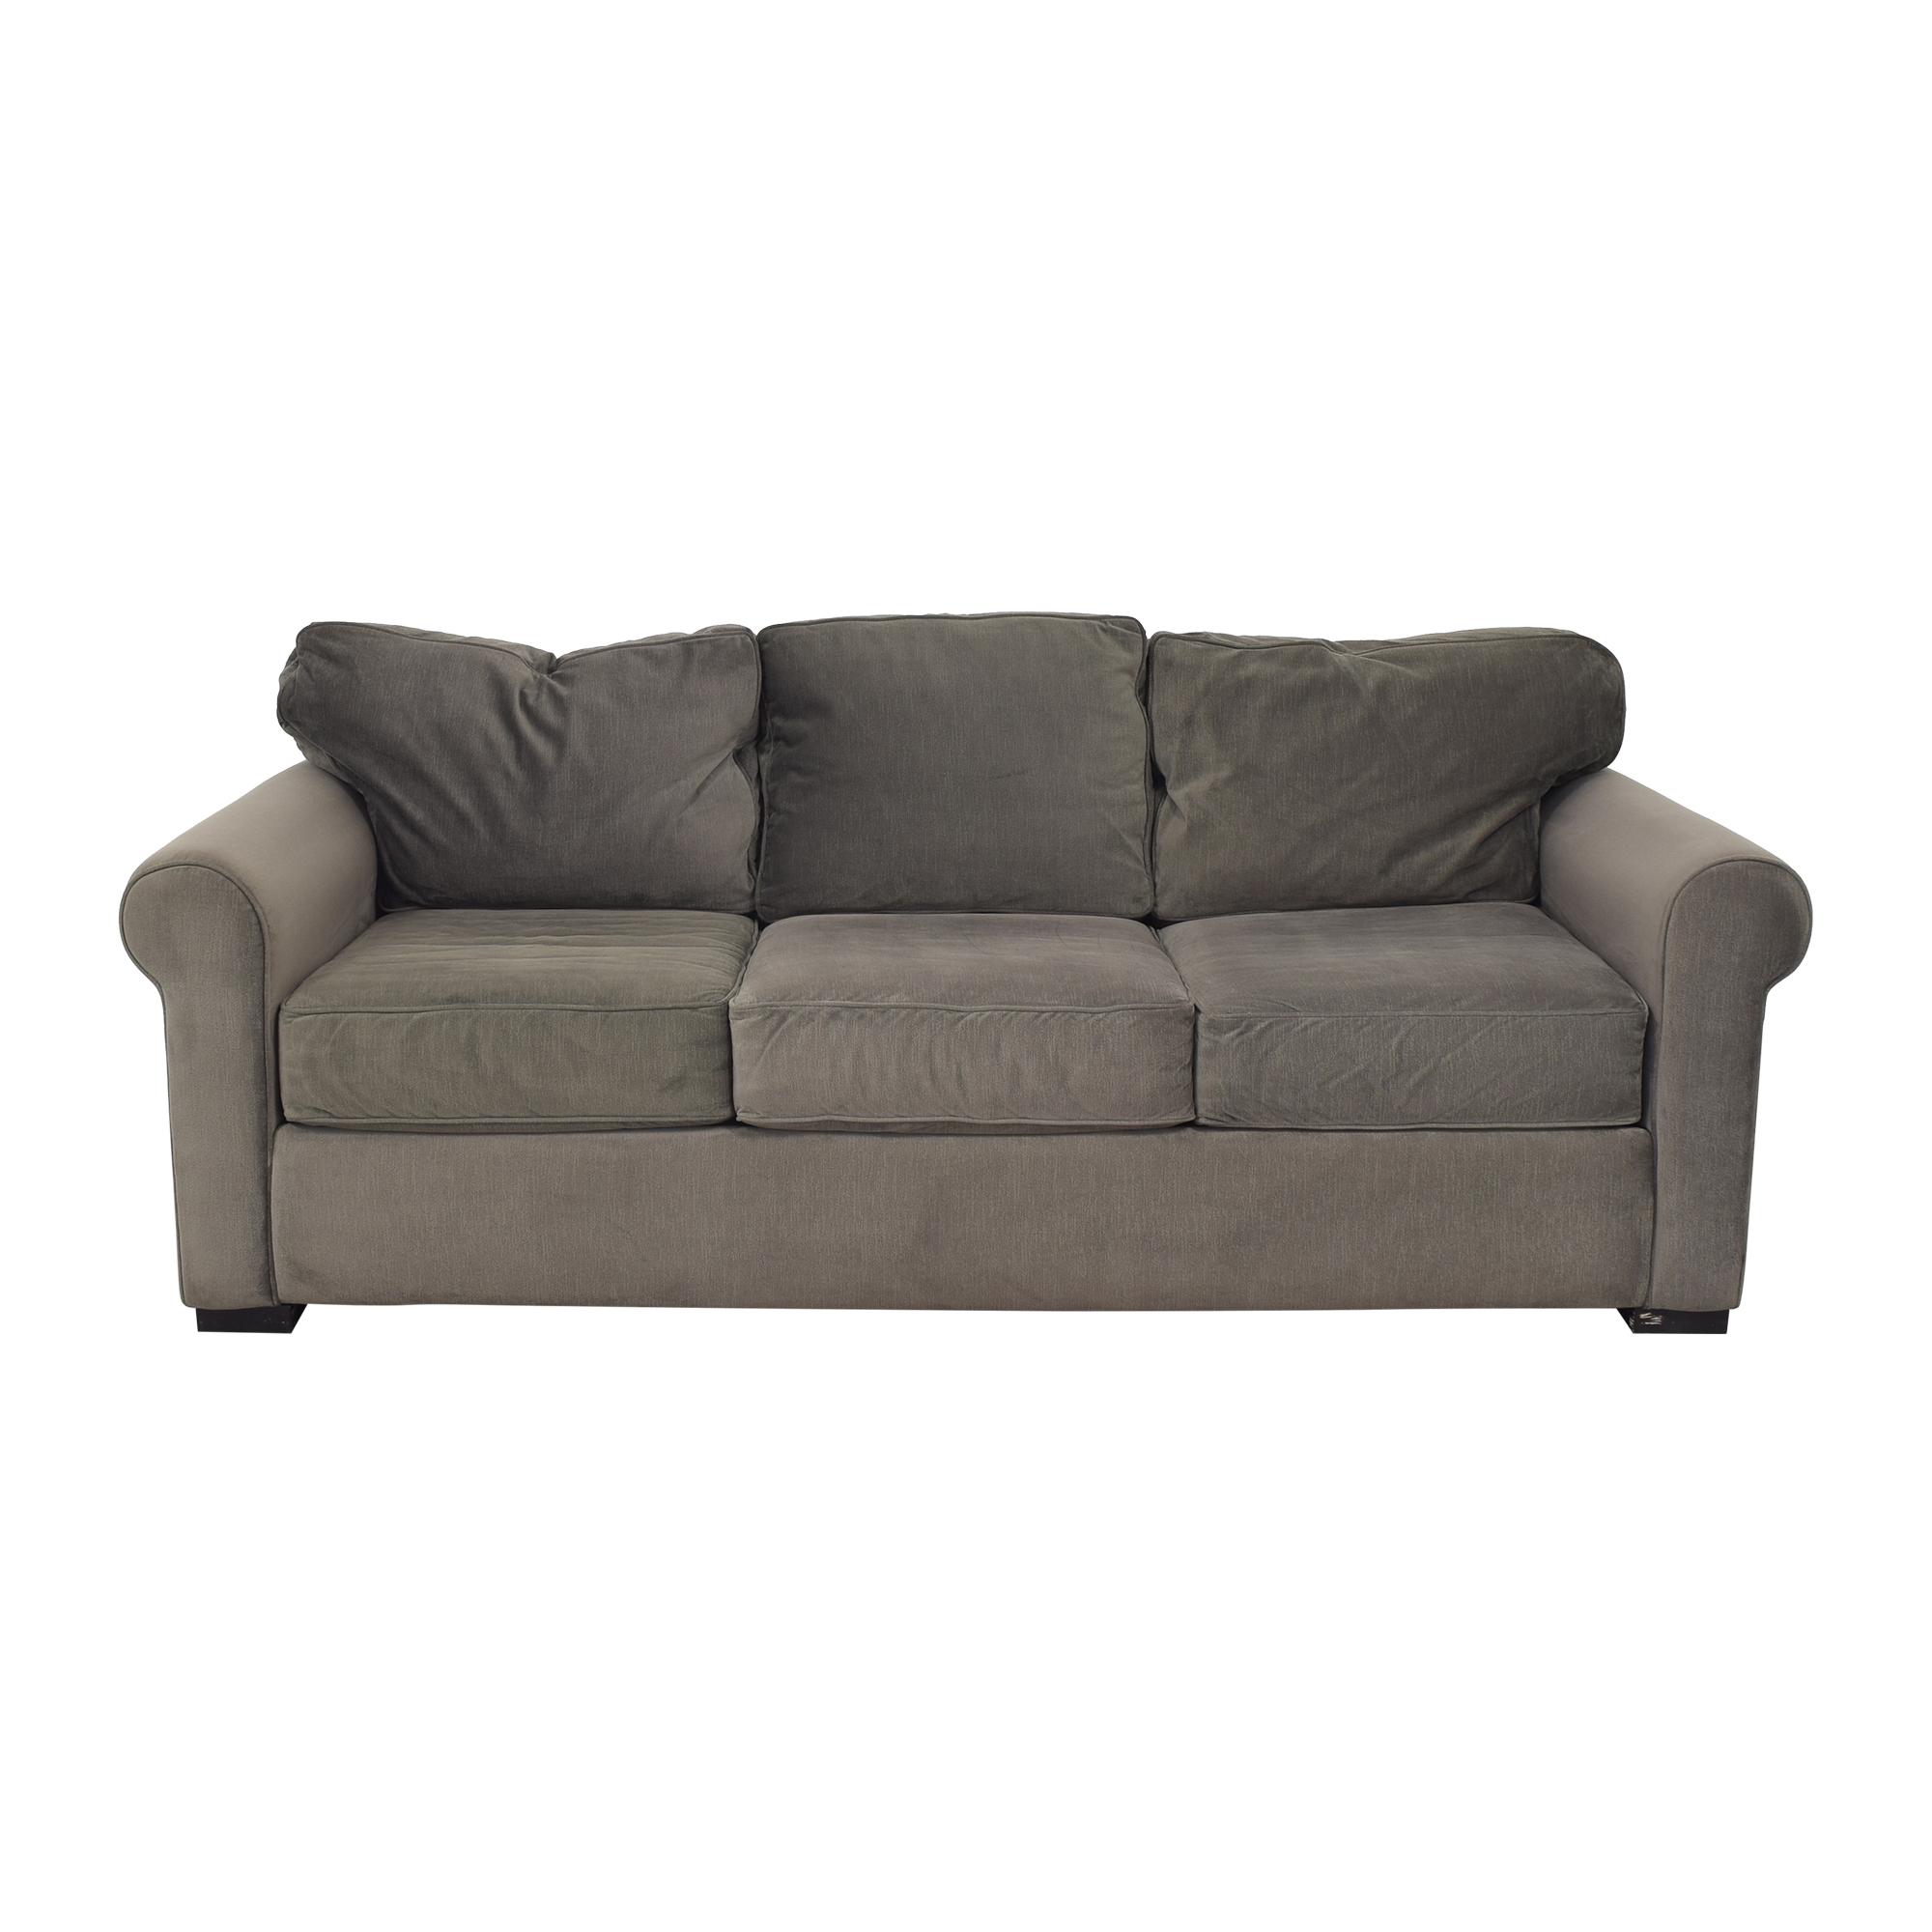 buy Jonathan Louis Jonathan Louis Rolled Arm Sofa online